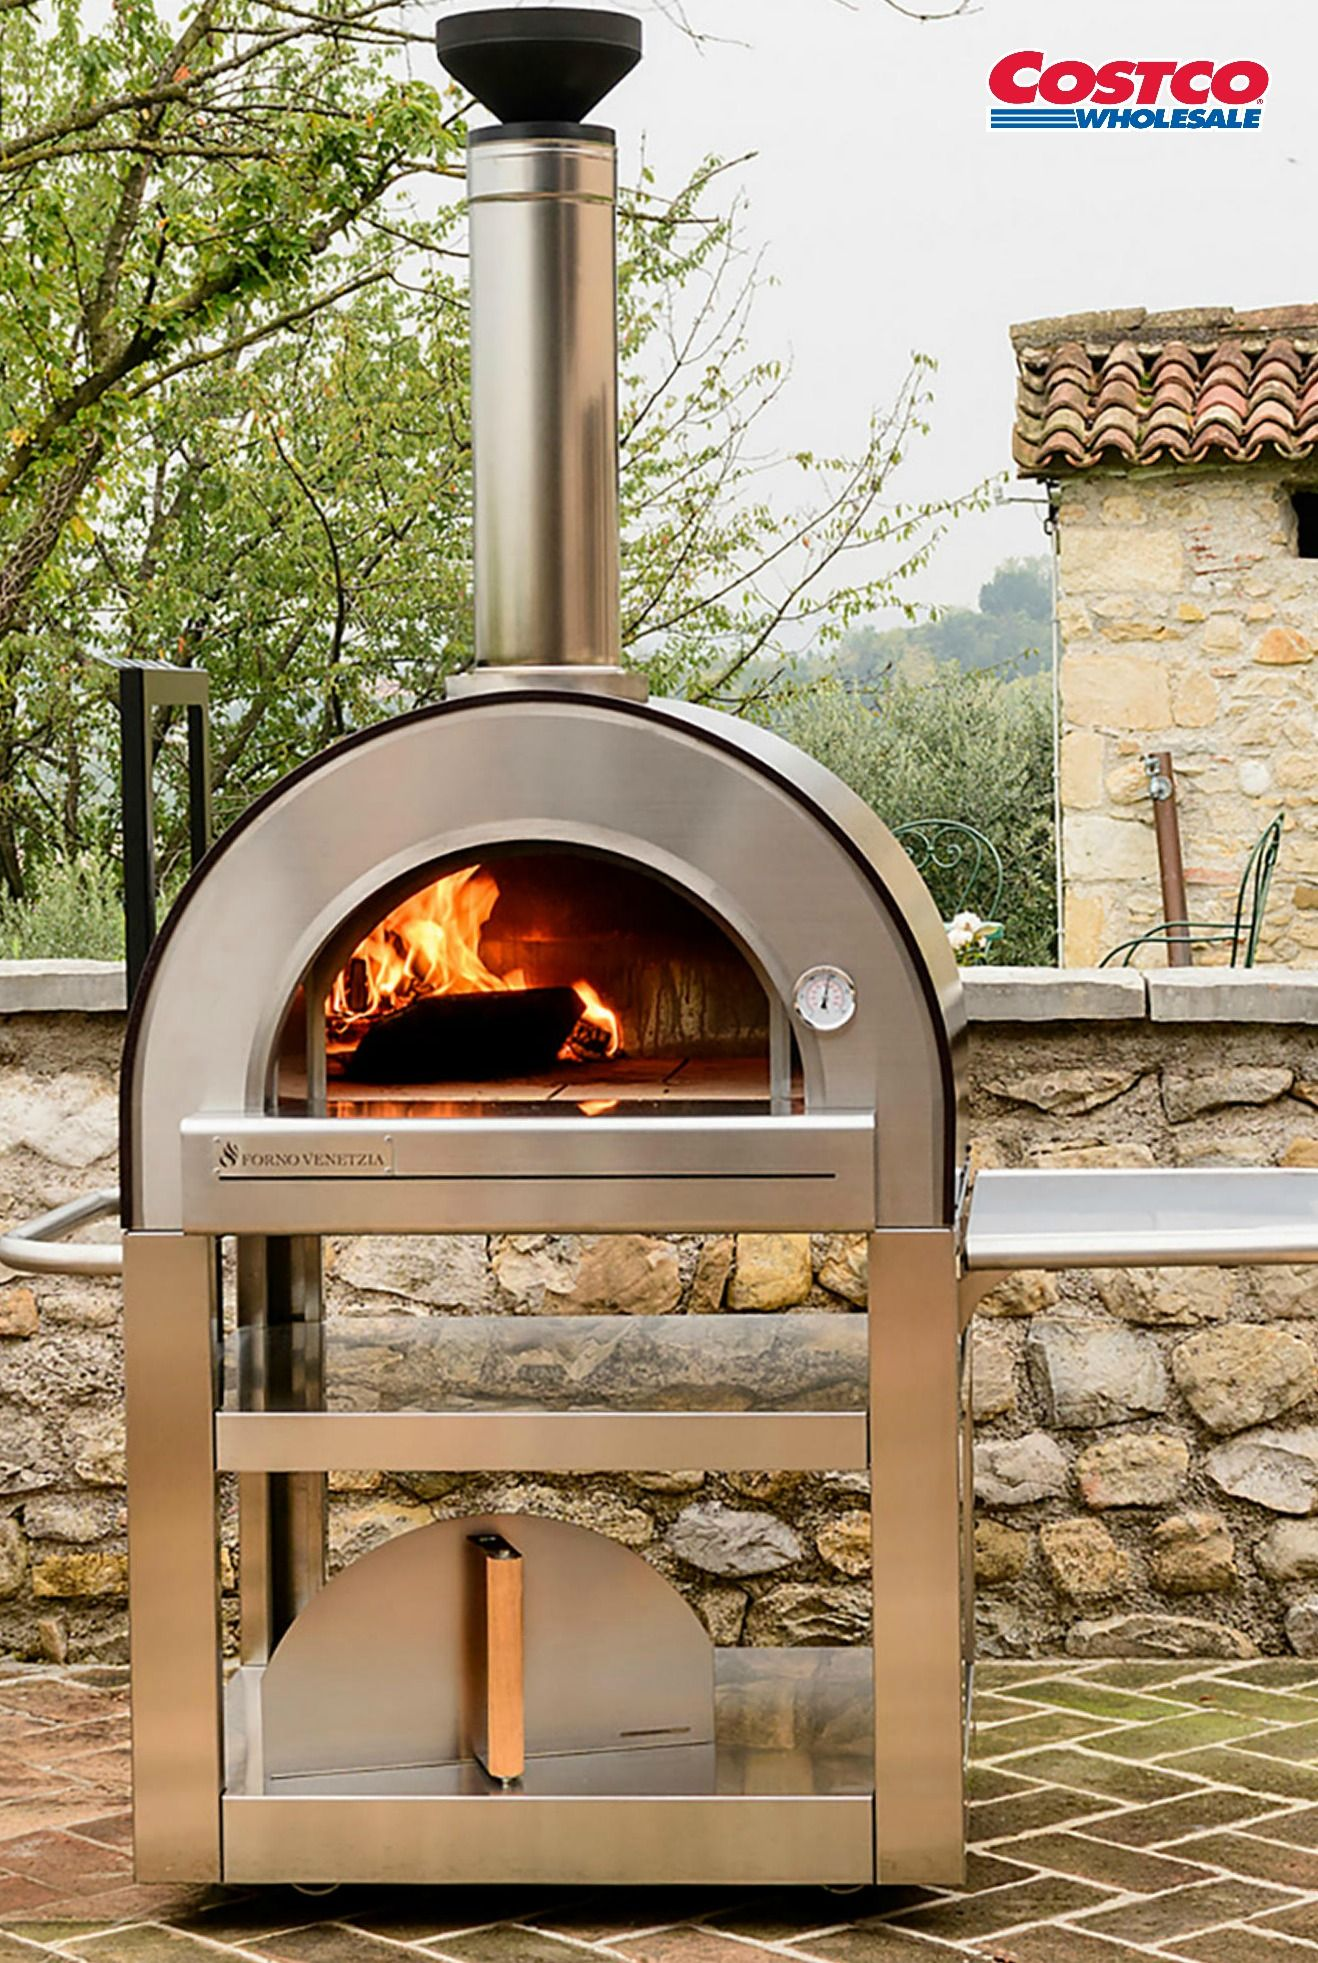 Forno Venetzia Pronto 500 Outdoor Wood Burning Pizza Oven Wood Burning Pizza Oven Pizza Oven Outdoor Kitchen Pizza Oven